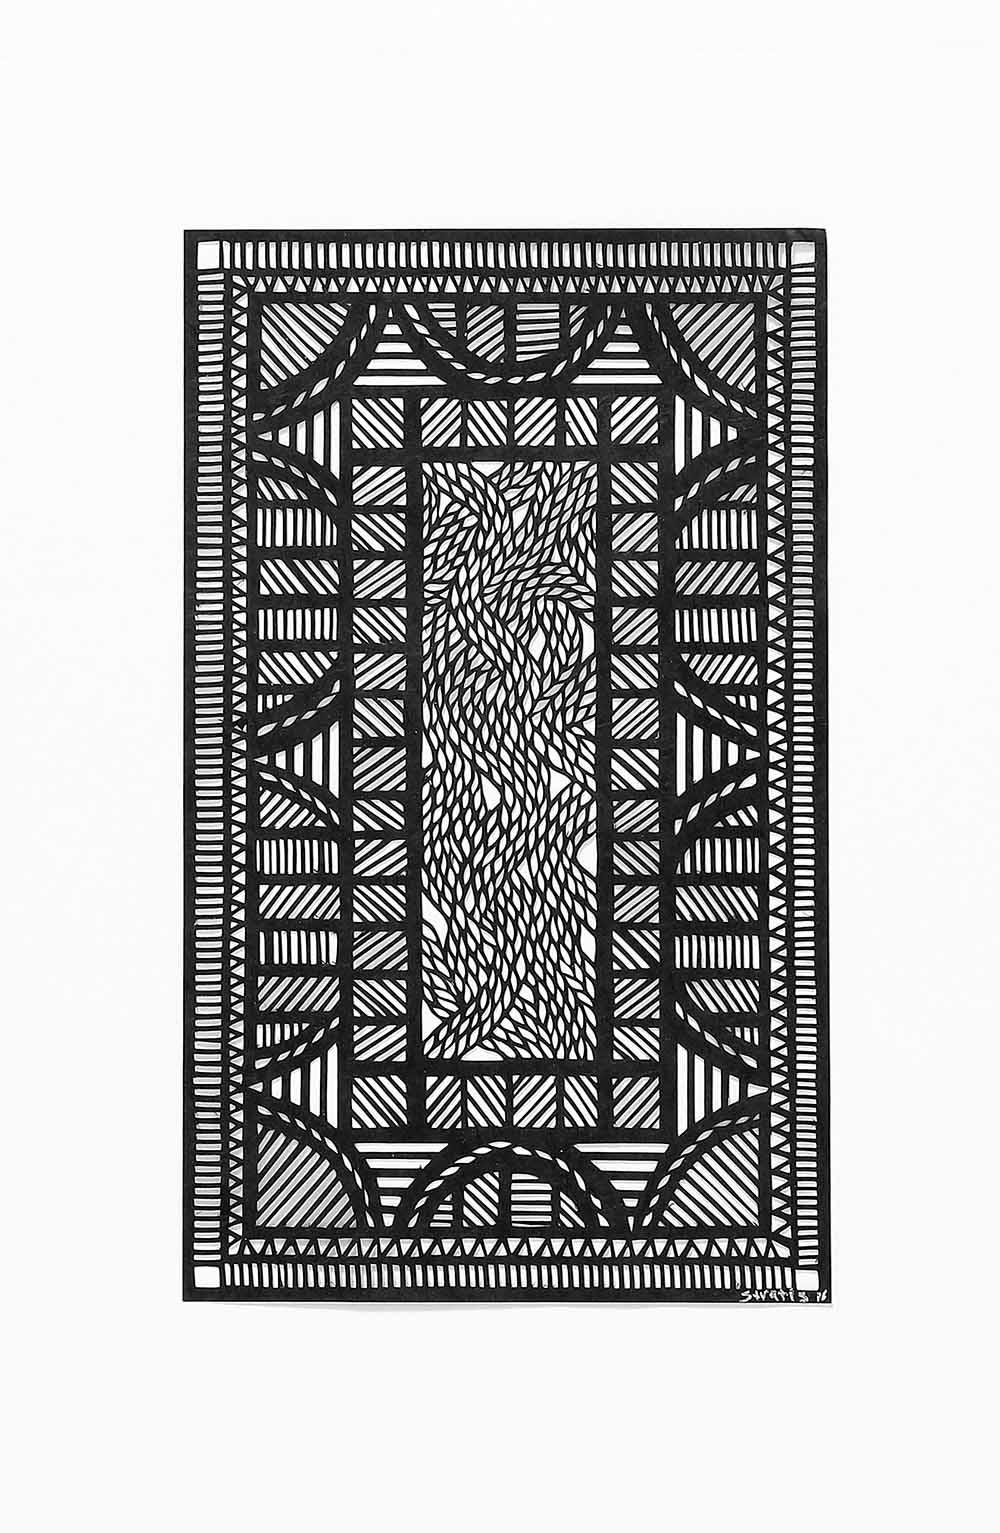 Untitled Black Geometrical